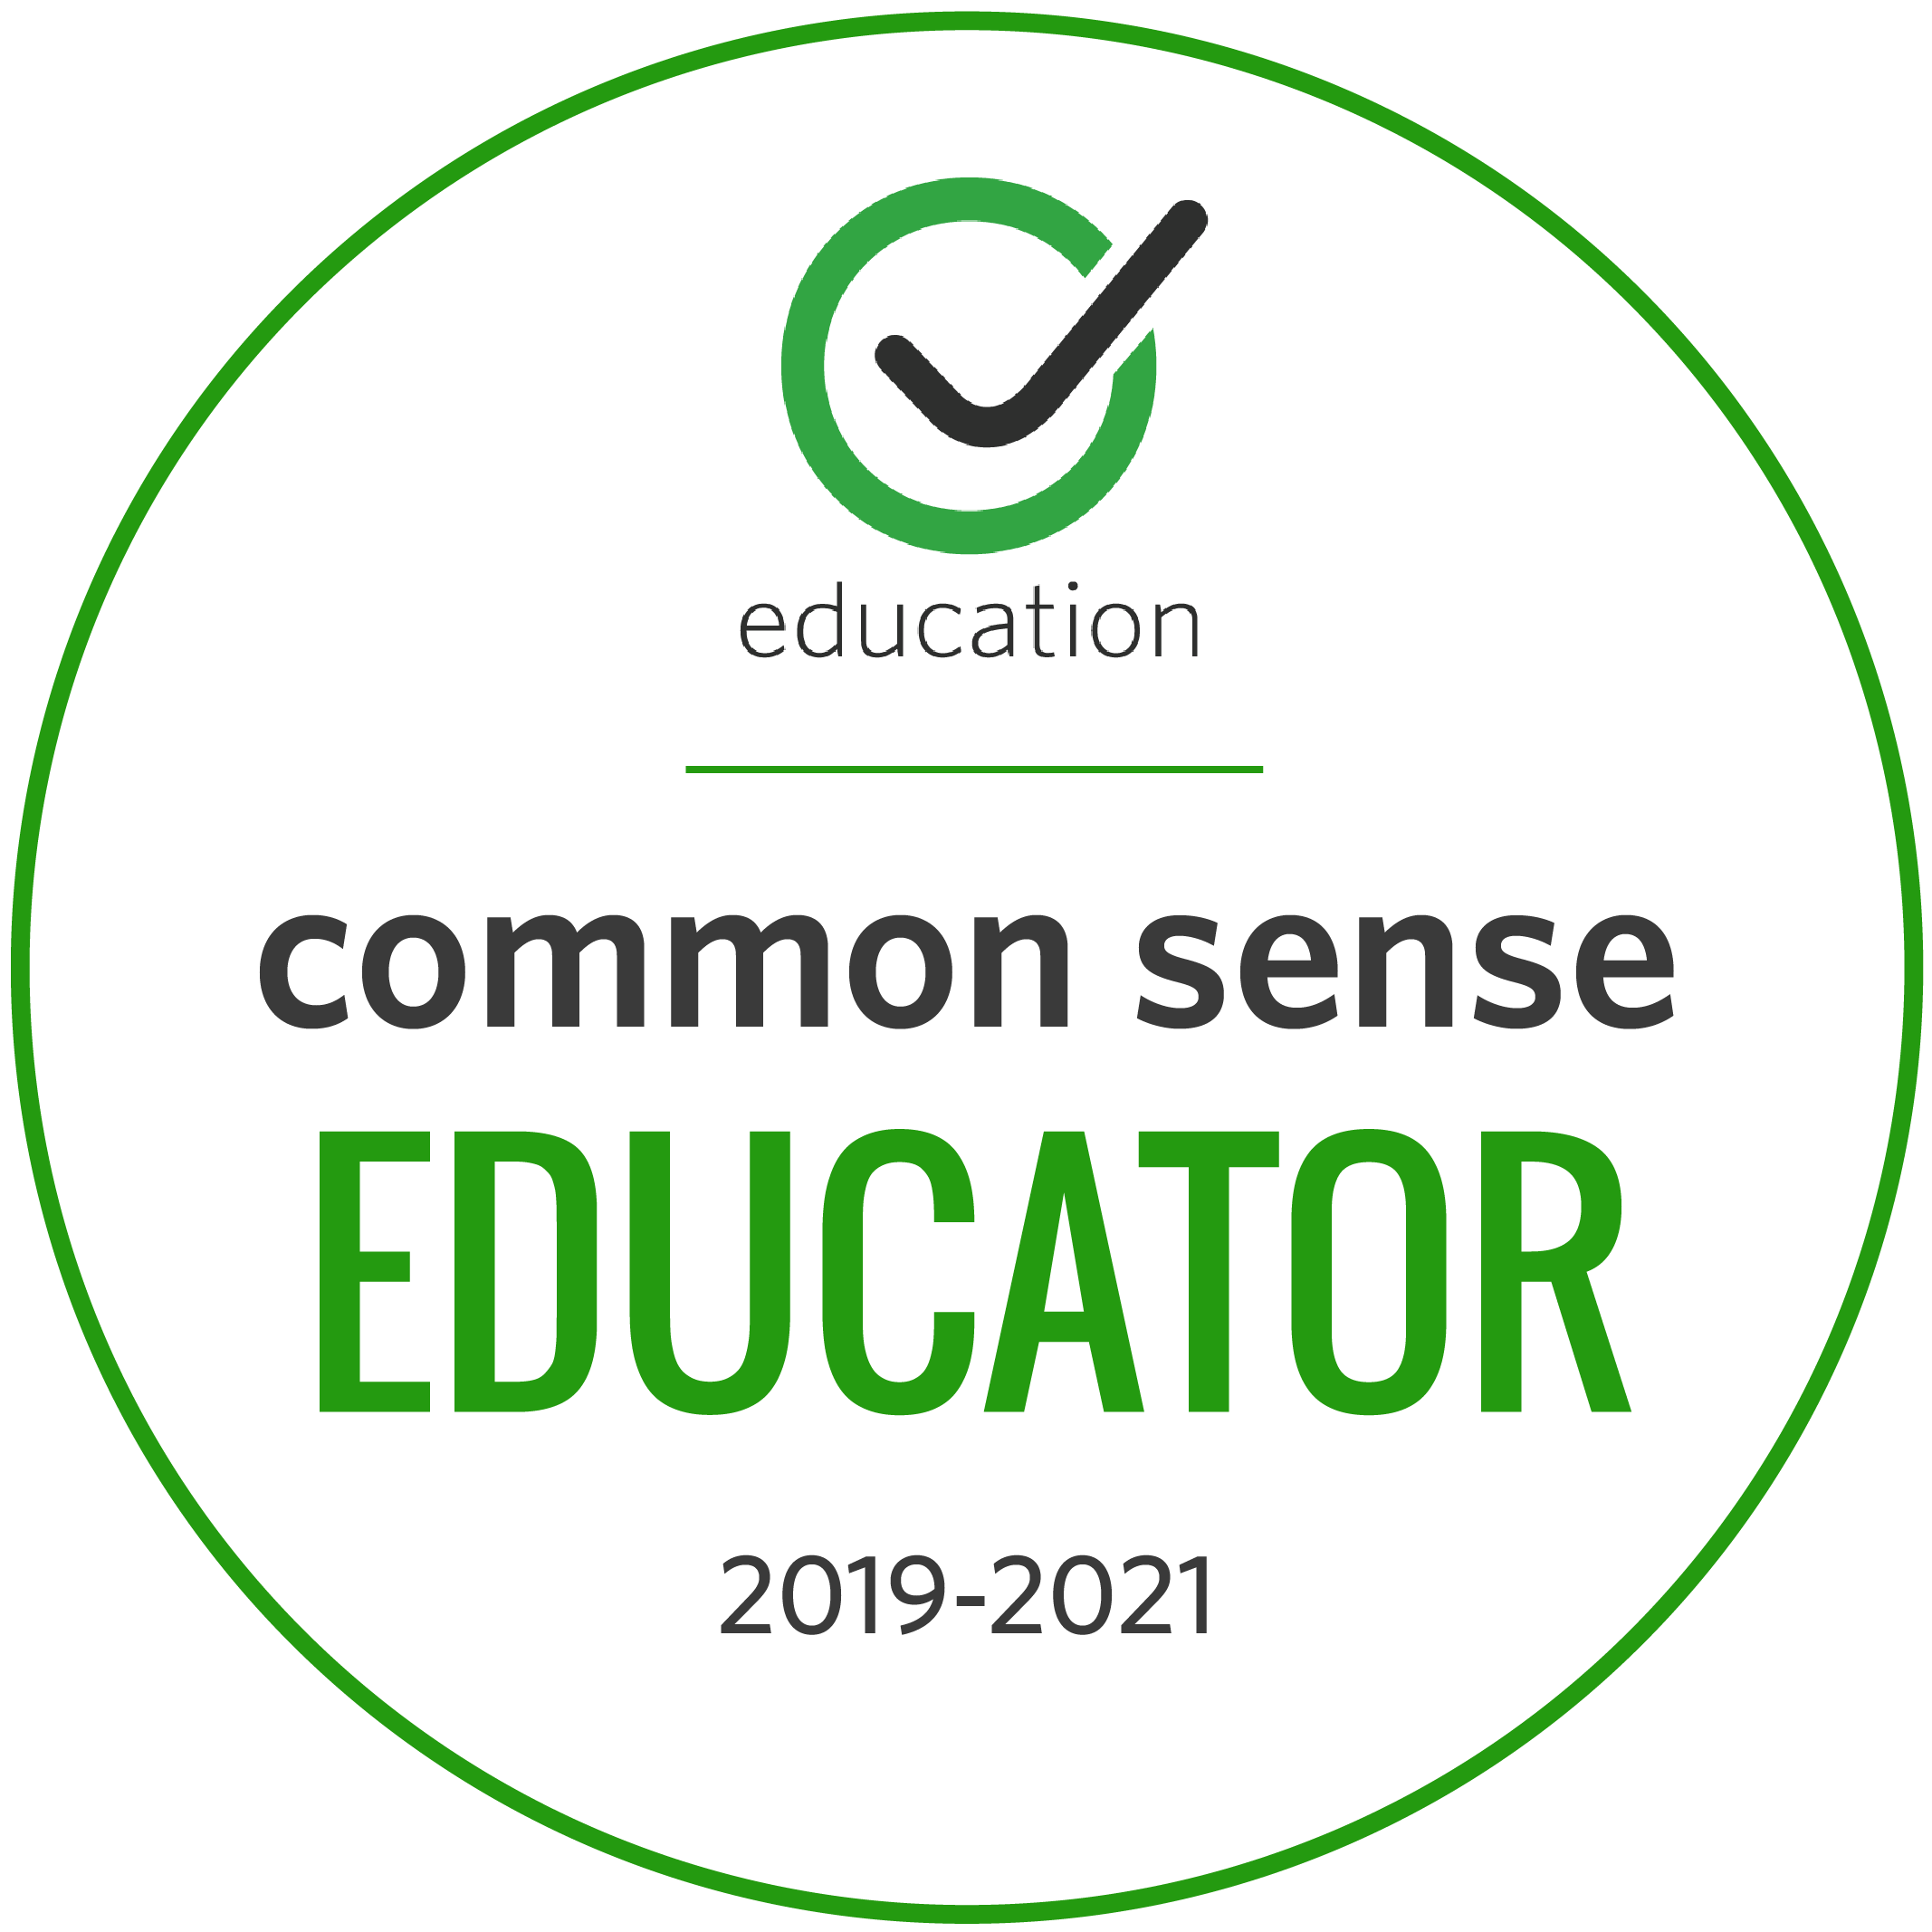 Common Sense Educator badge